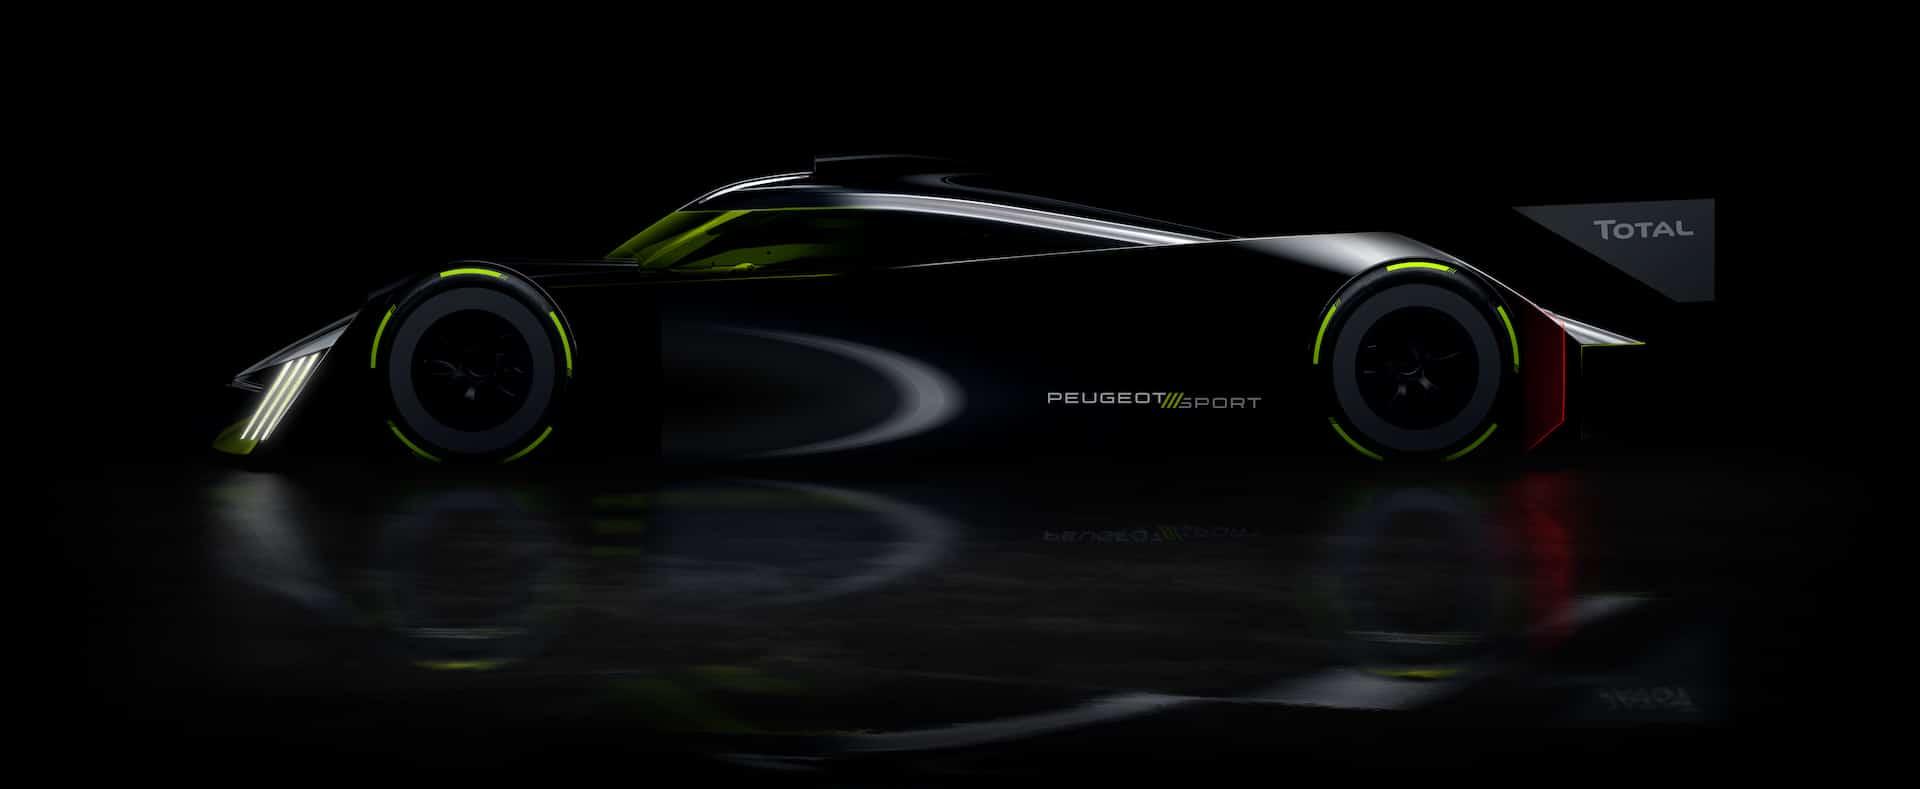 Peugeot-Le-Mans-Sport-Hybrid-Hypercar-Heck